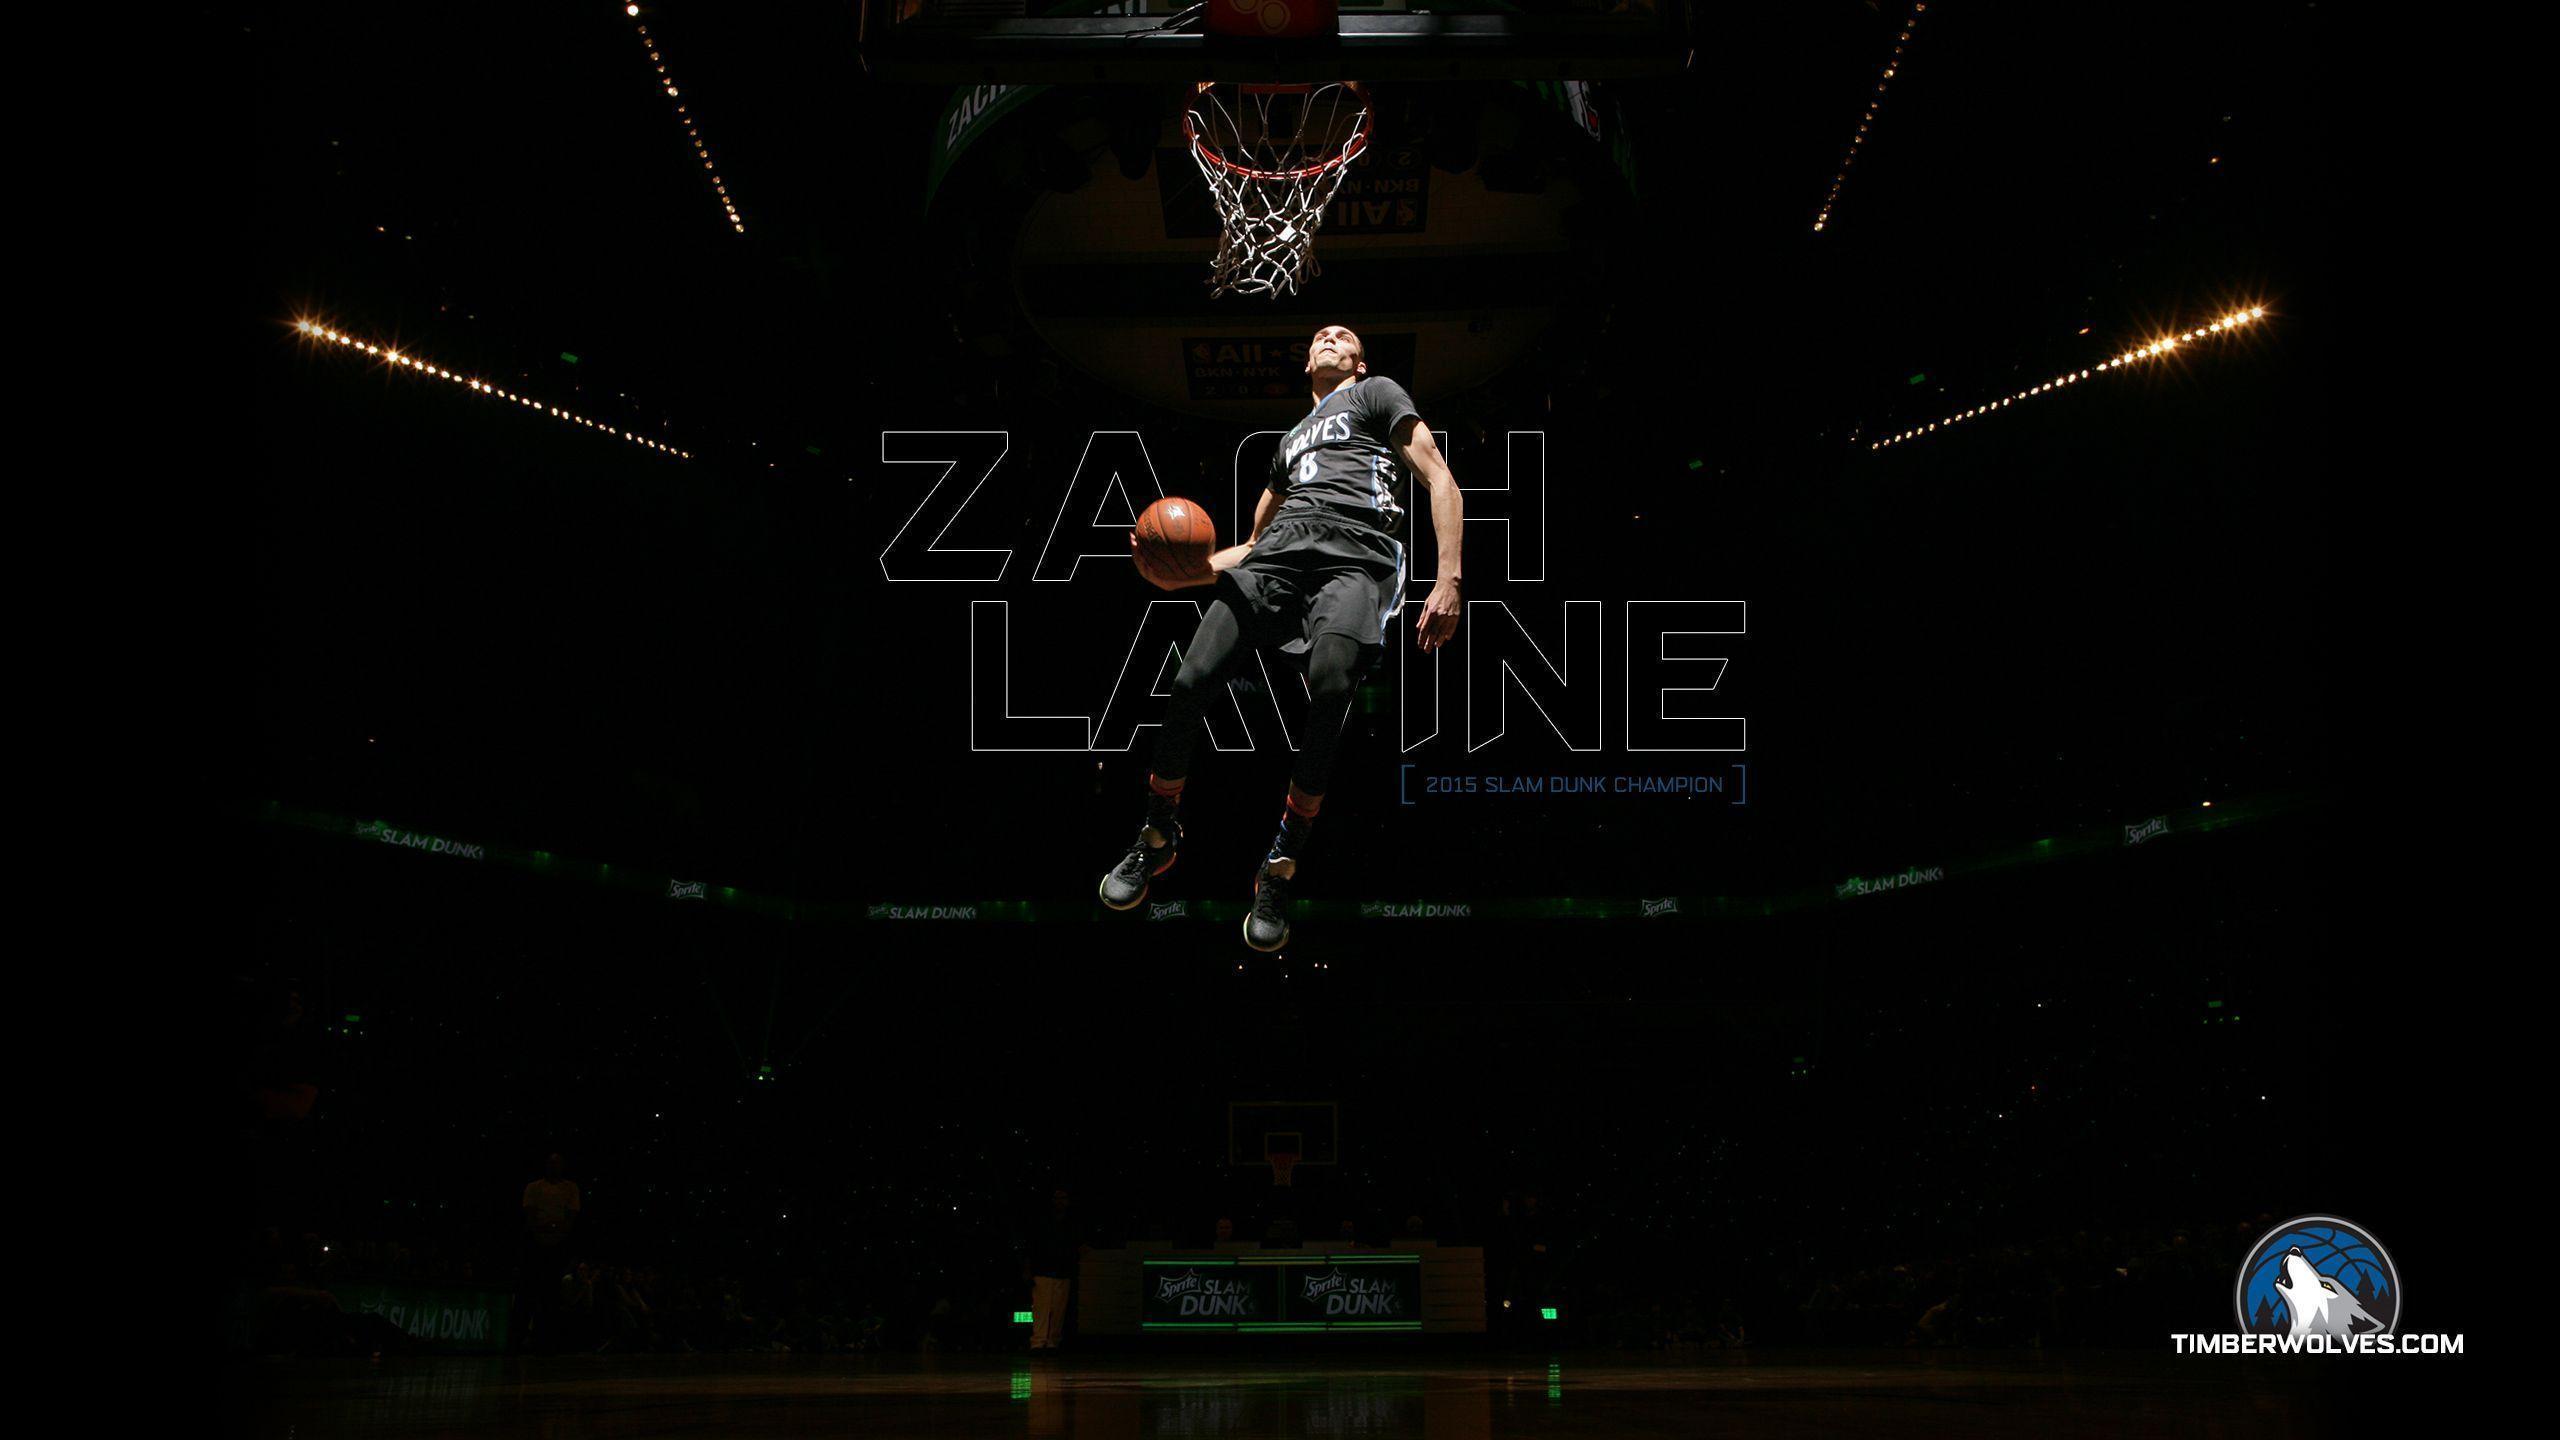 NBA Wallpapers 2016 - Wallpaper Cave